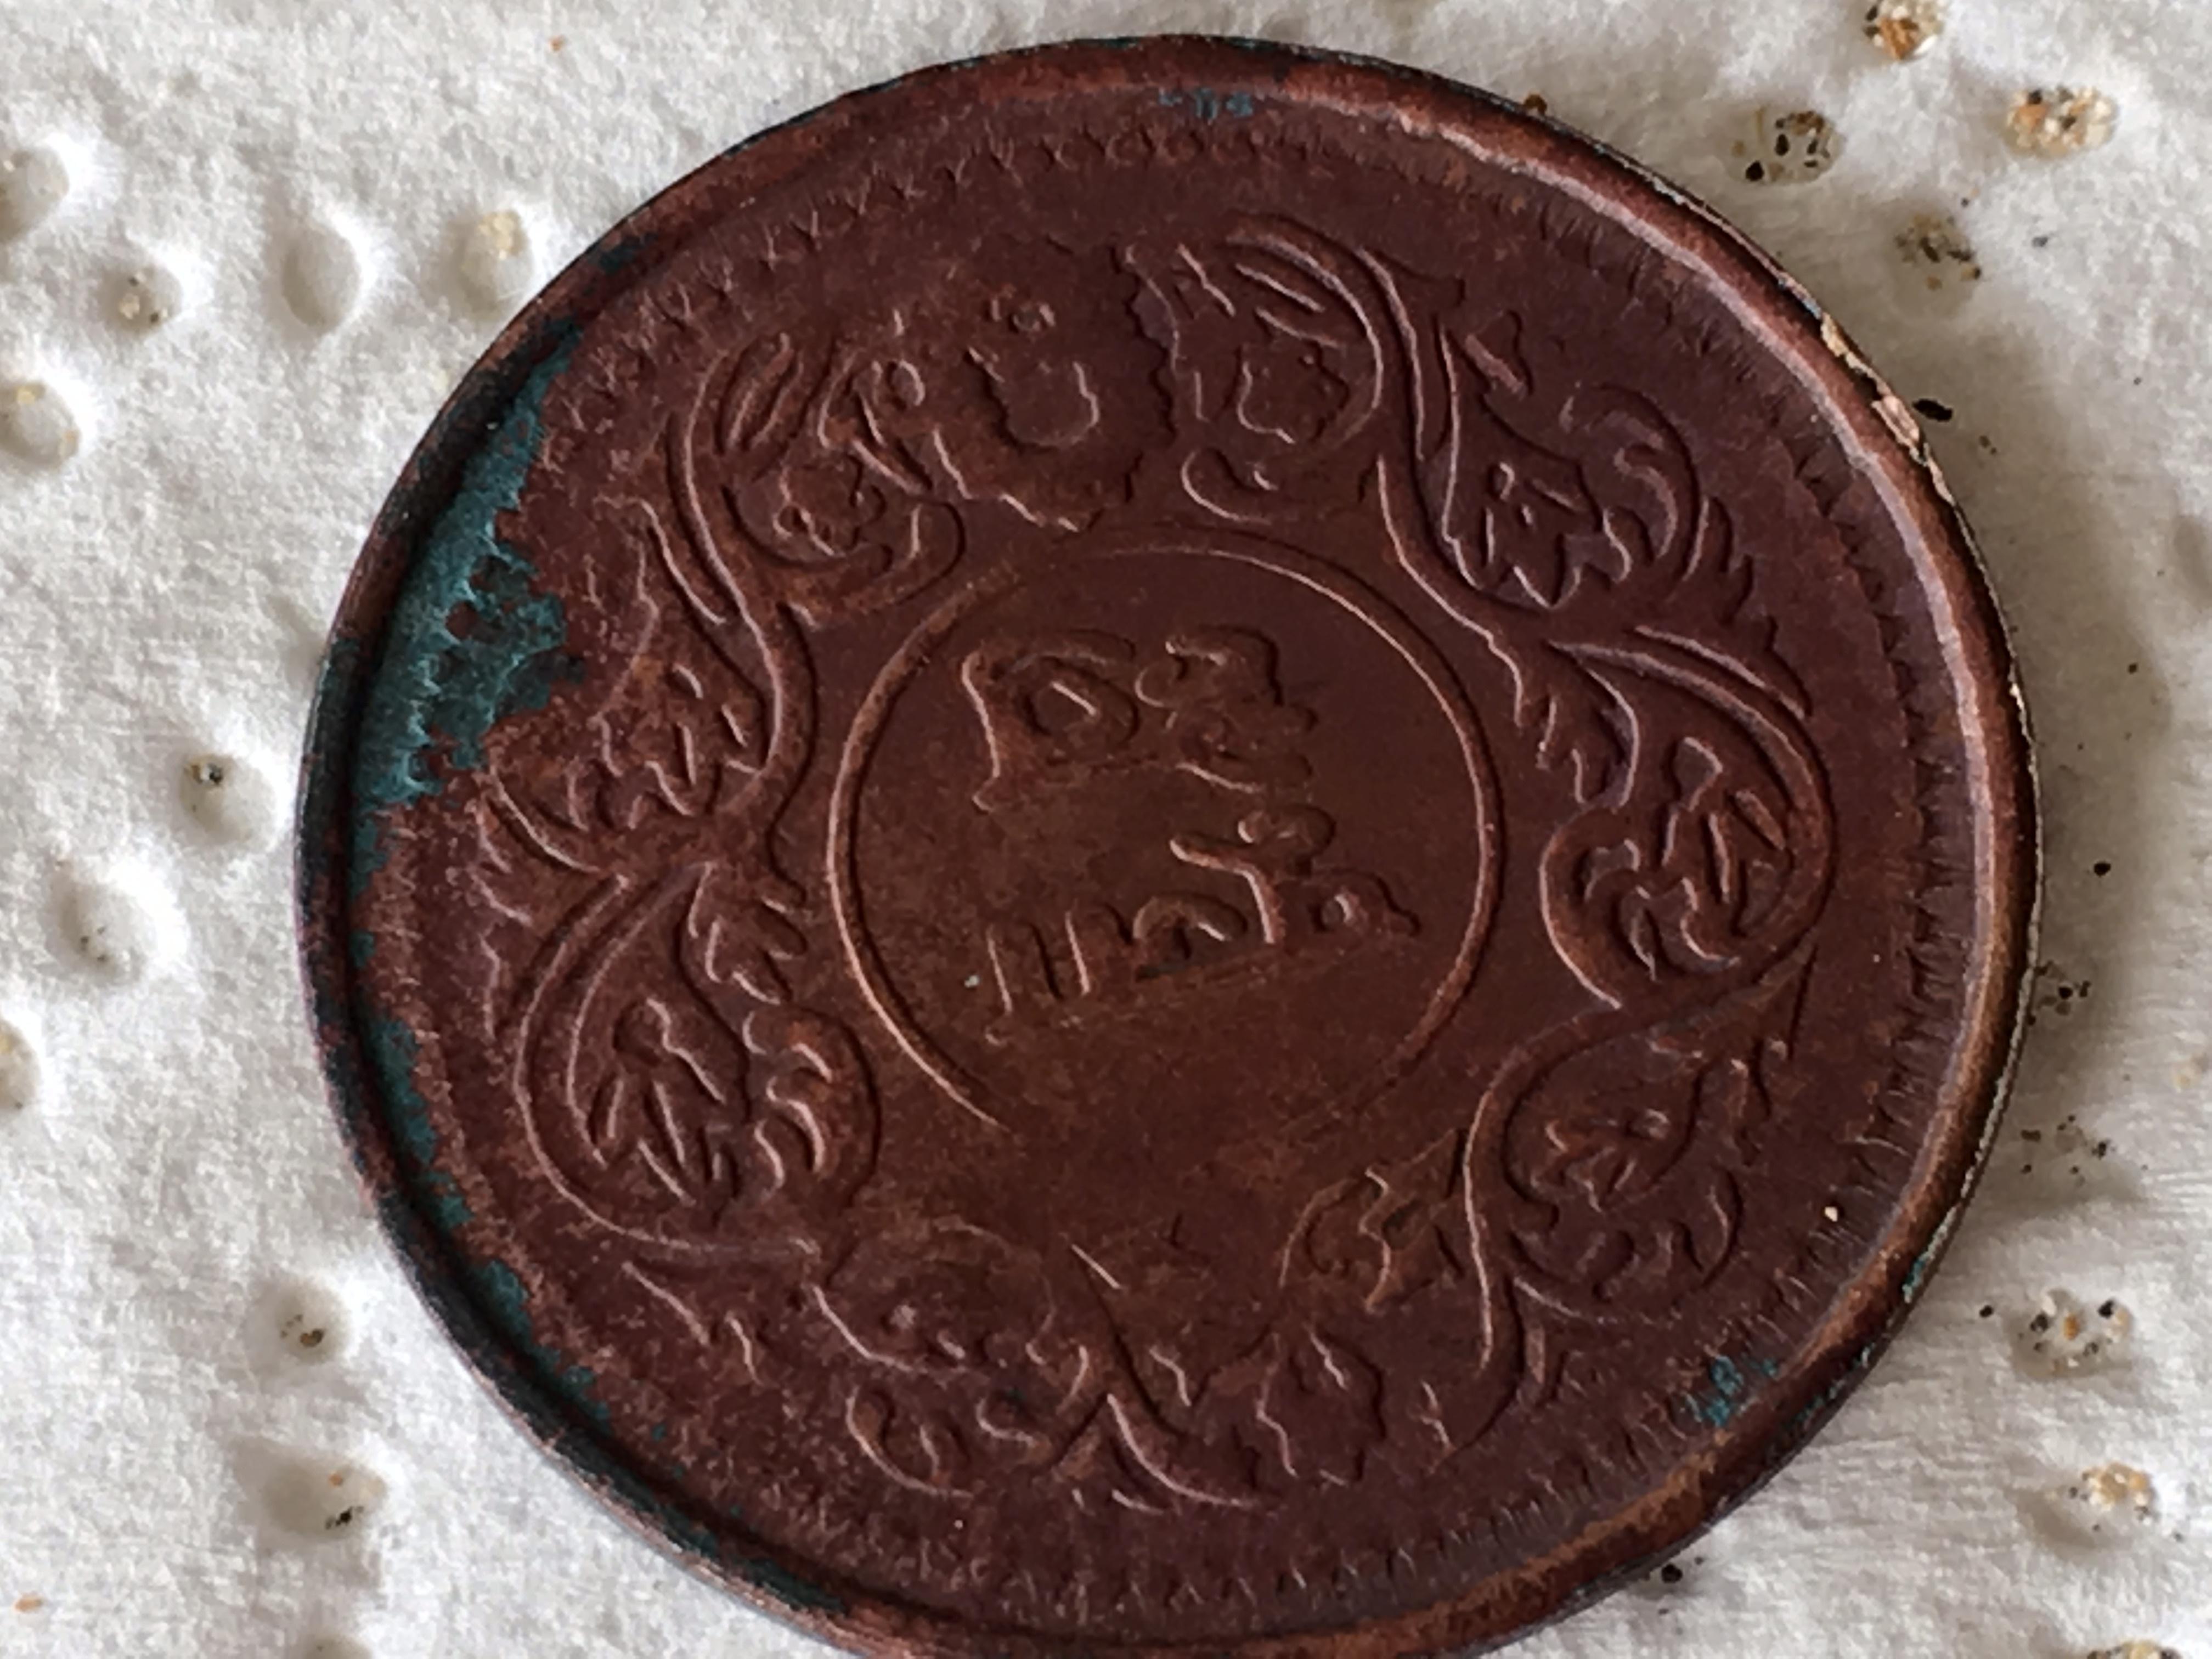 https://0901.nccdn.net/4_2/000/000/064/d40/Puja-Hetu-coin-4032x3024.jpg